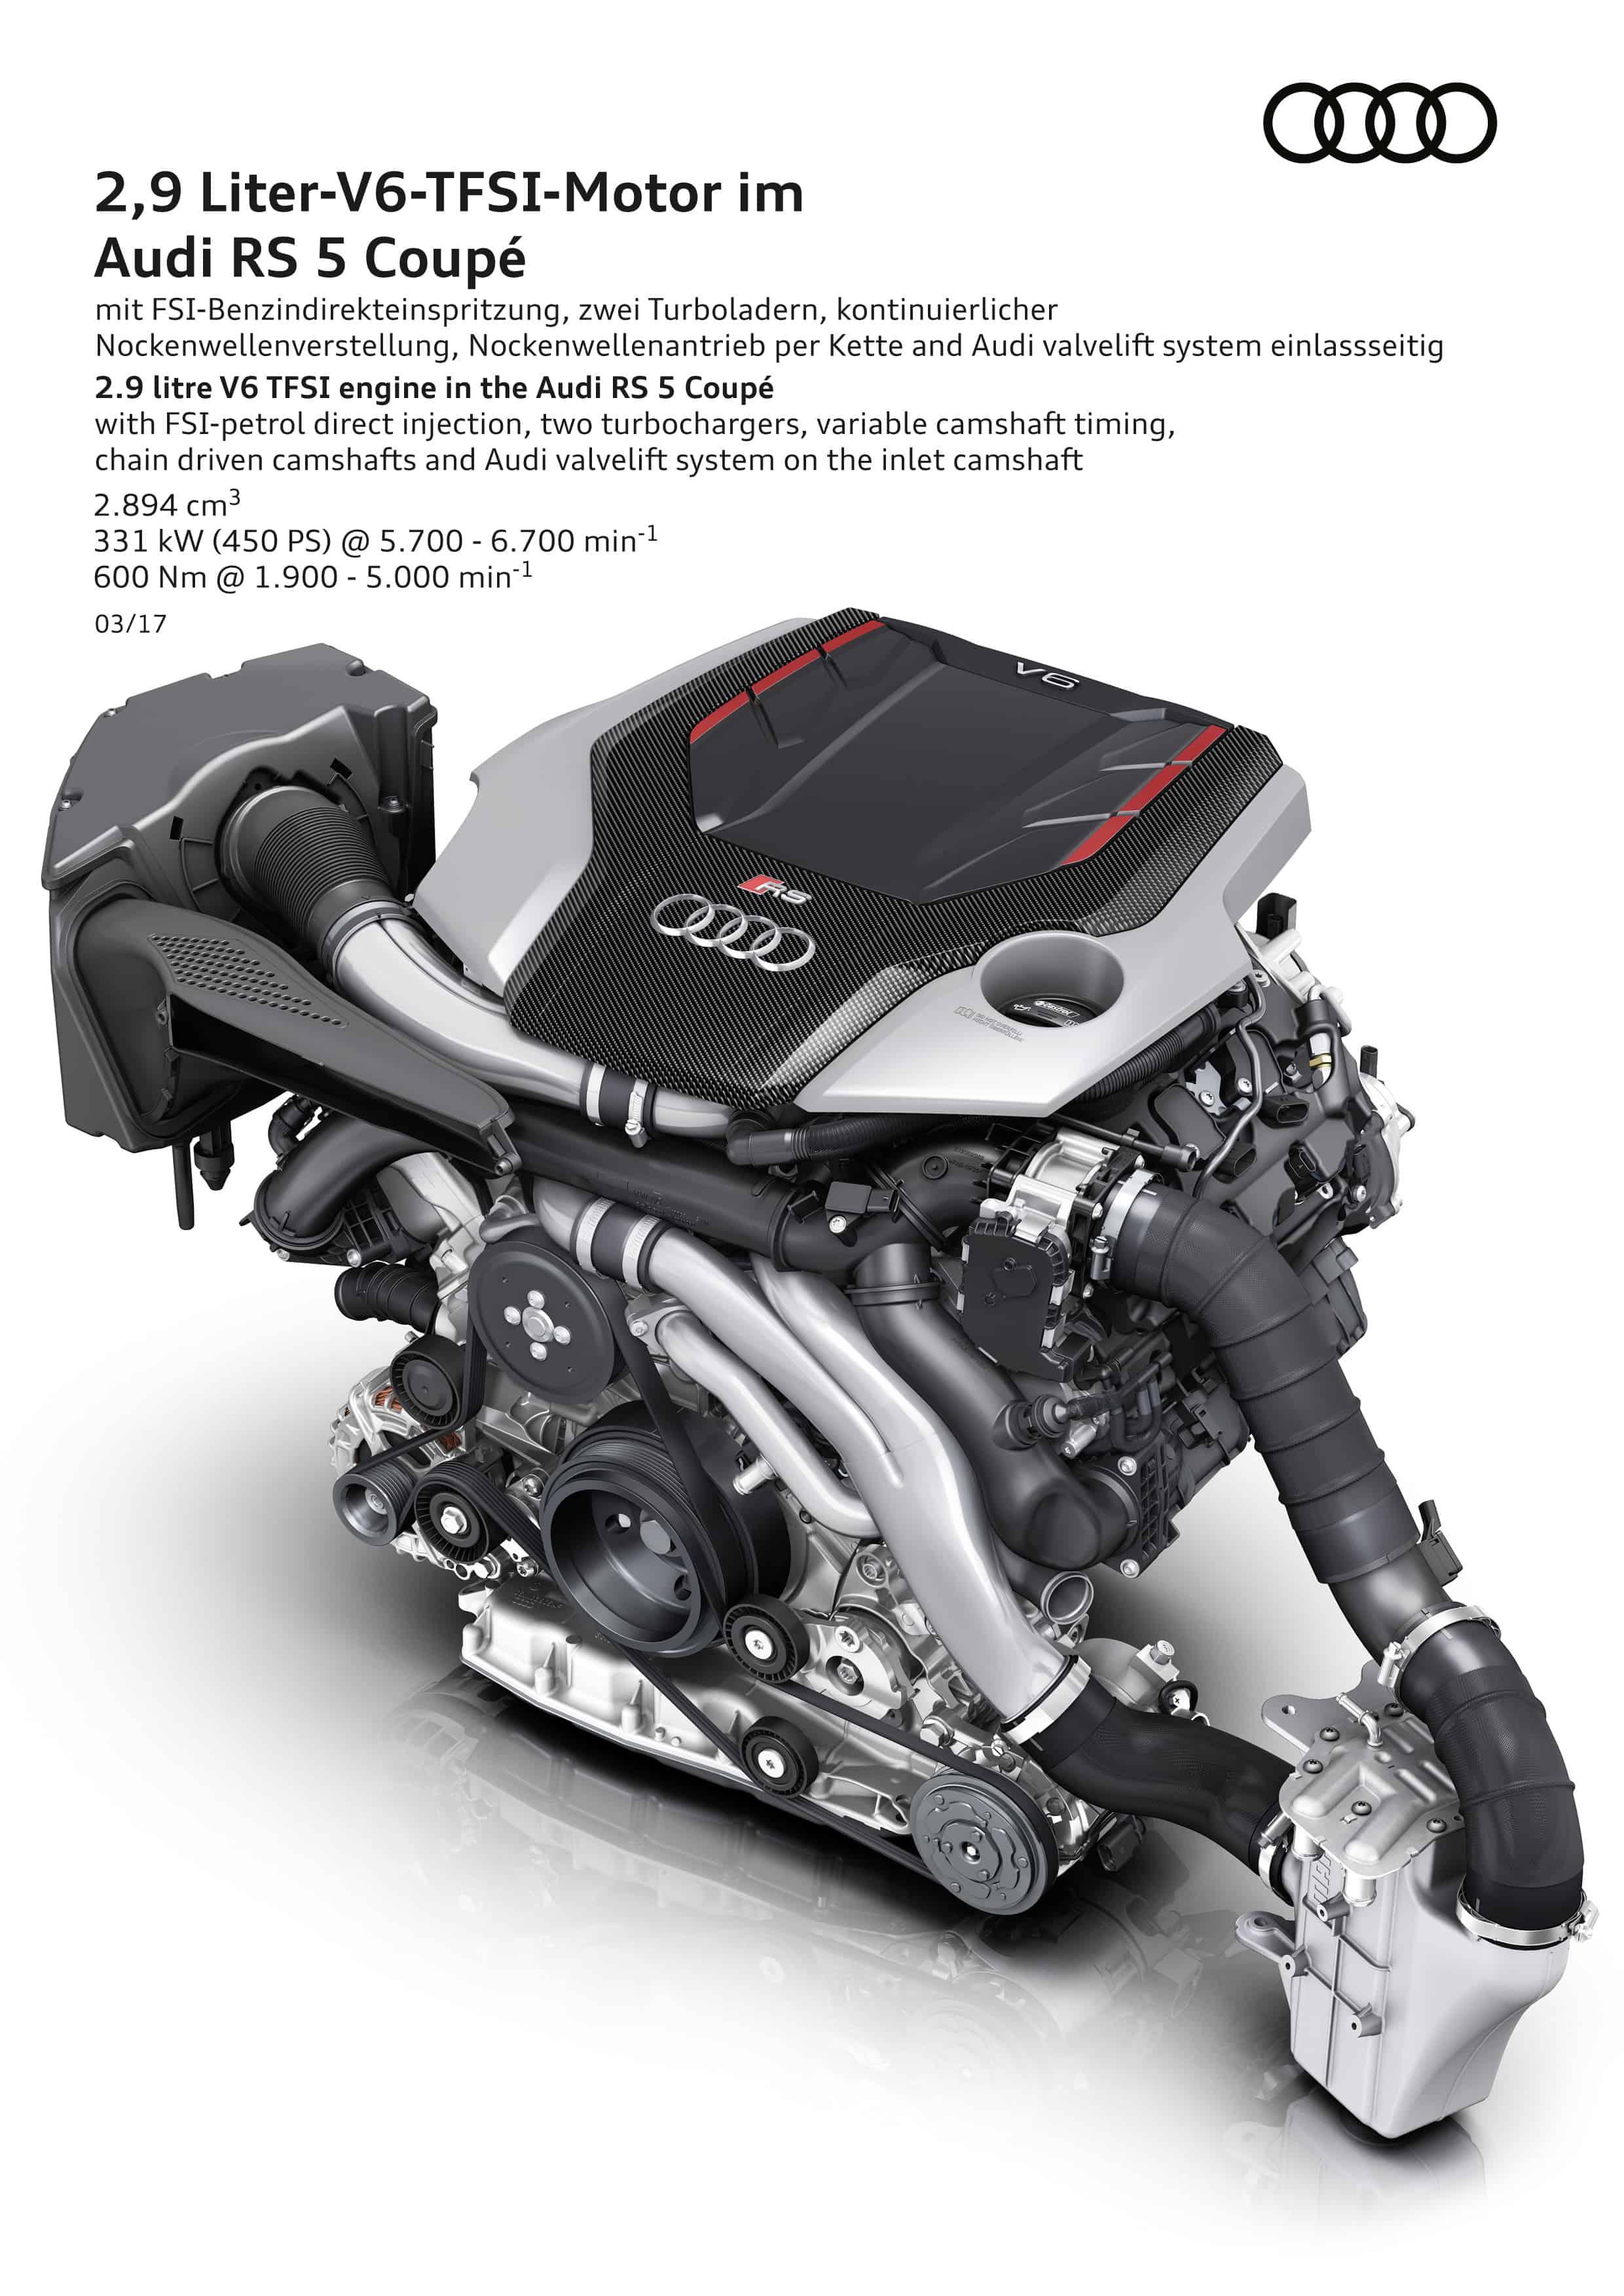 2.9 Liter V6 TFSI Motor - Audi RS 5 Coupé